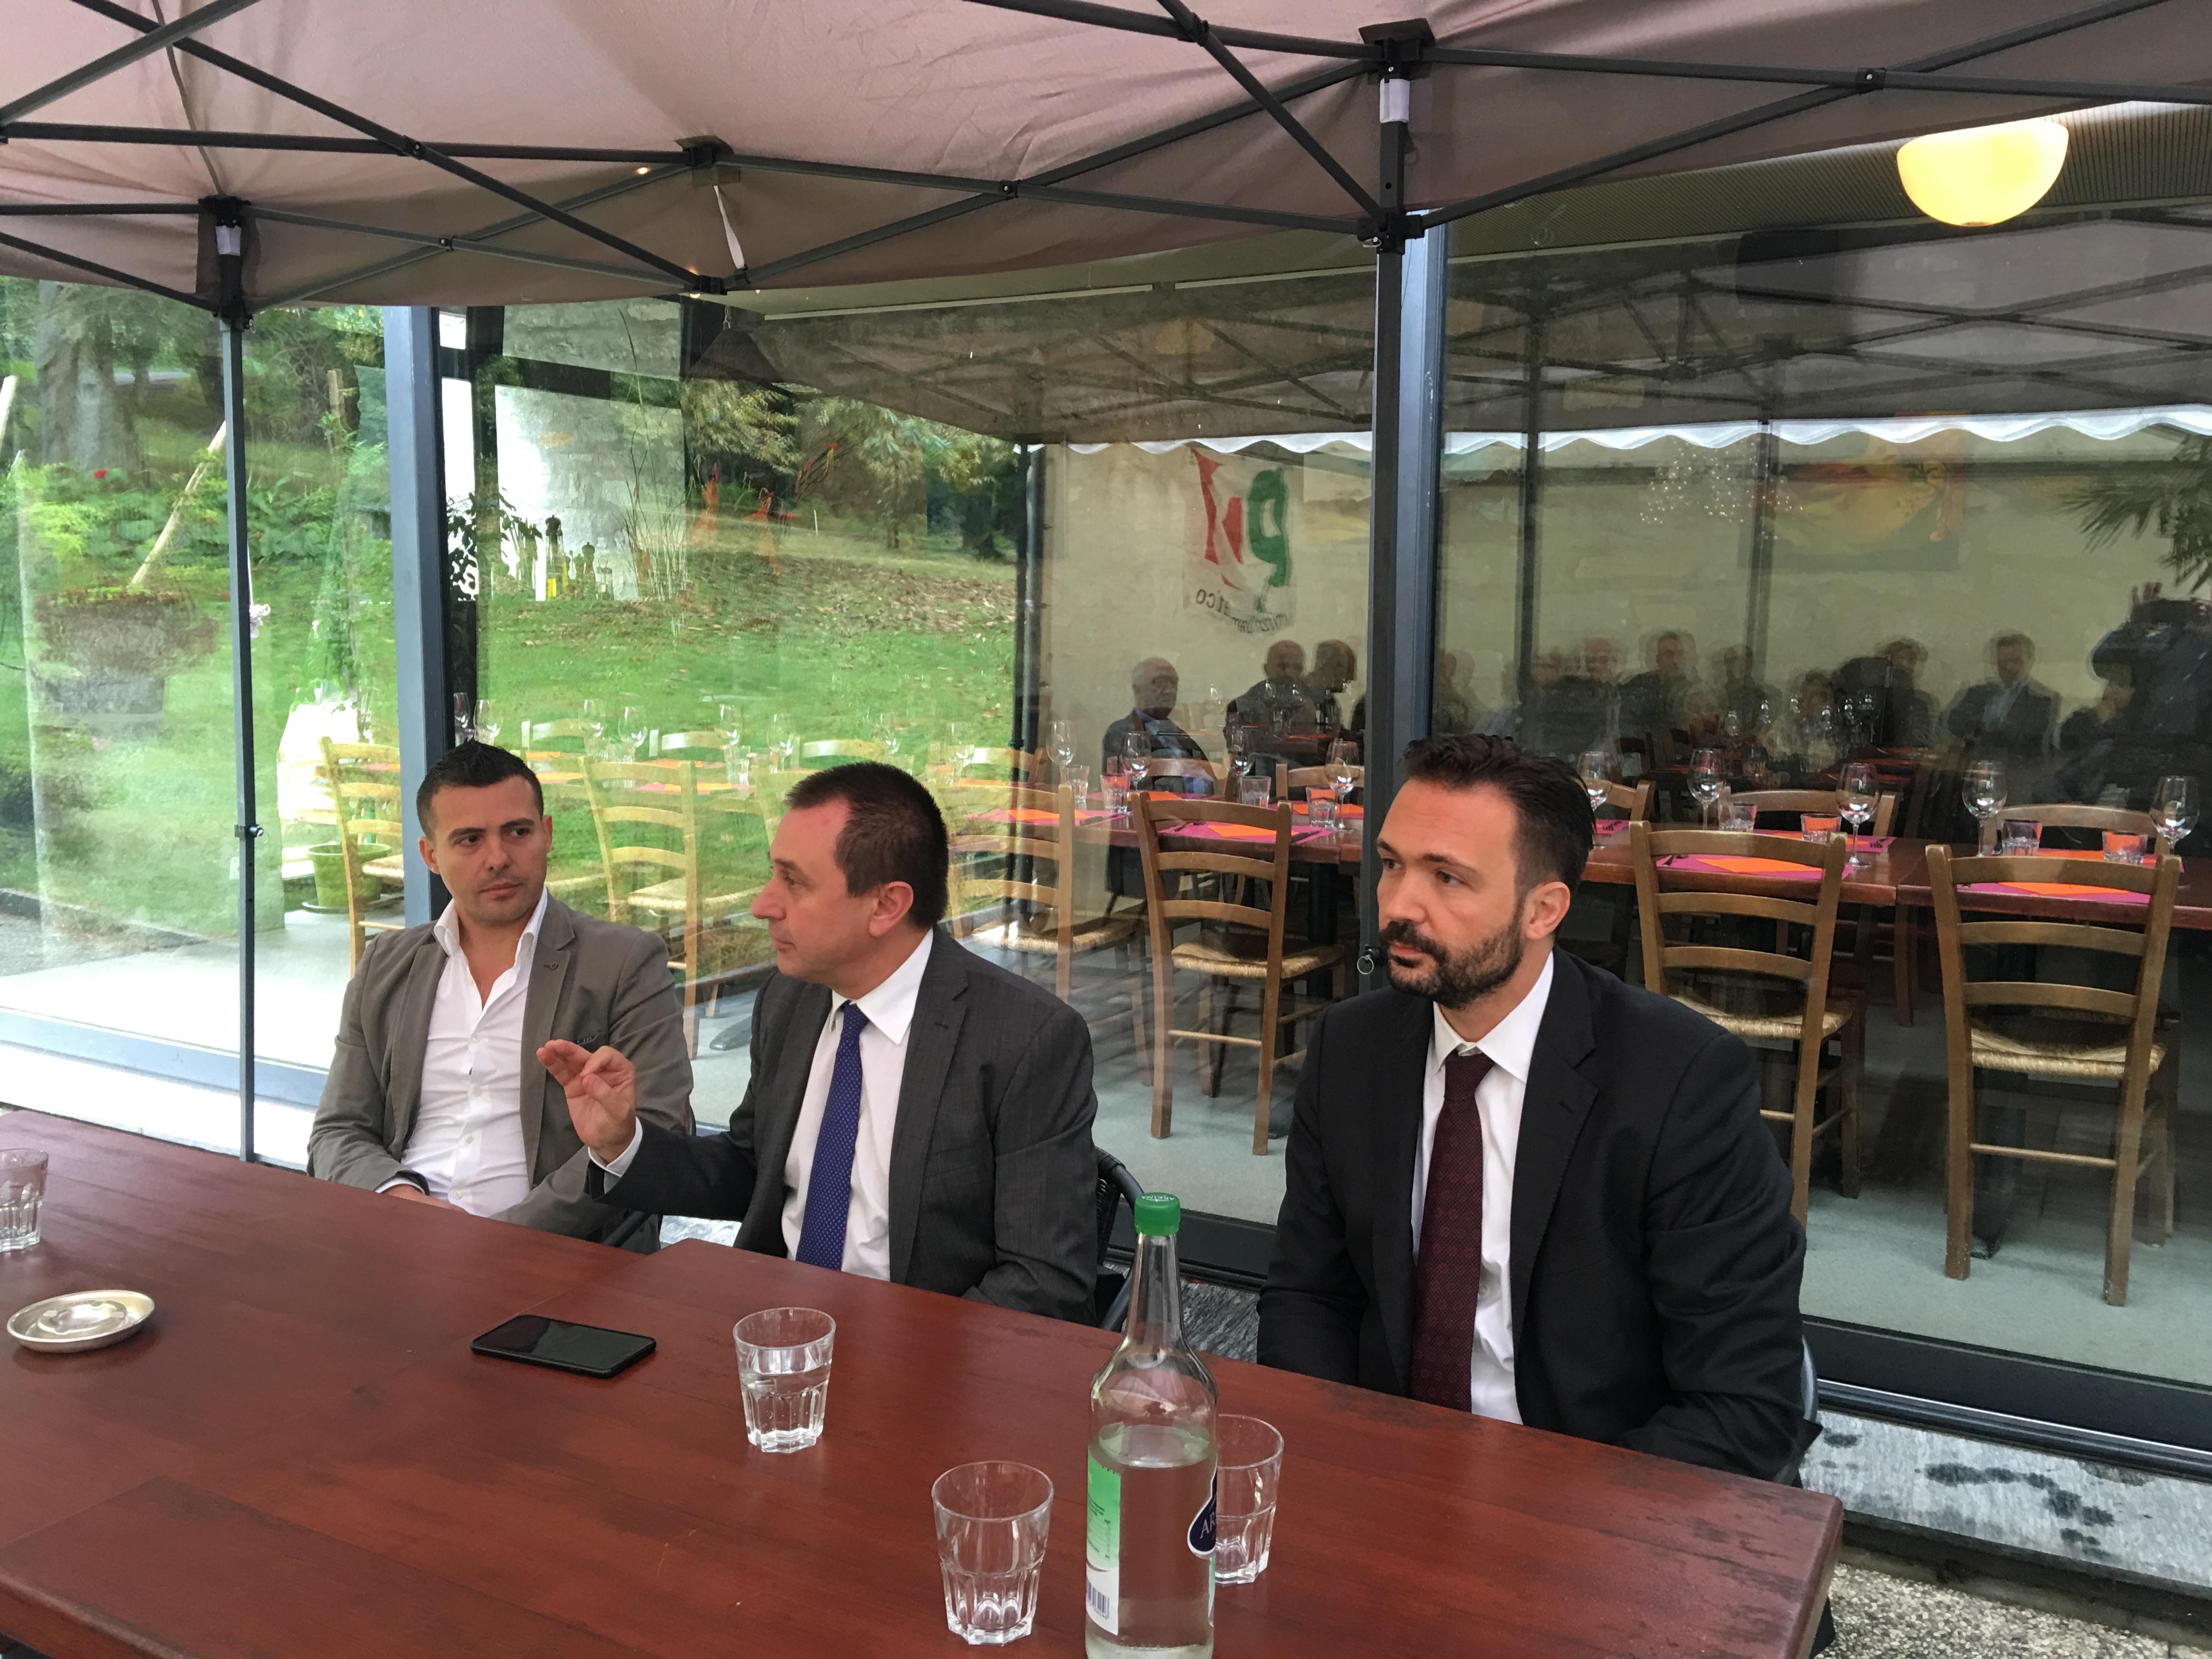 Incontro su referendum riforma costituzionale - Lugano